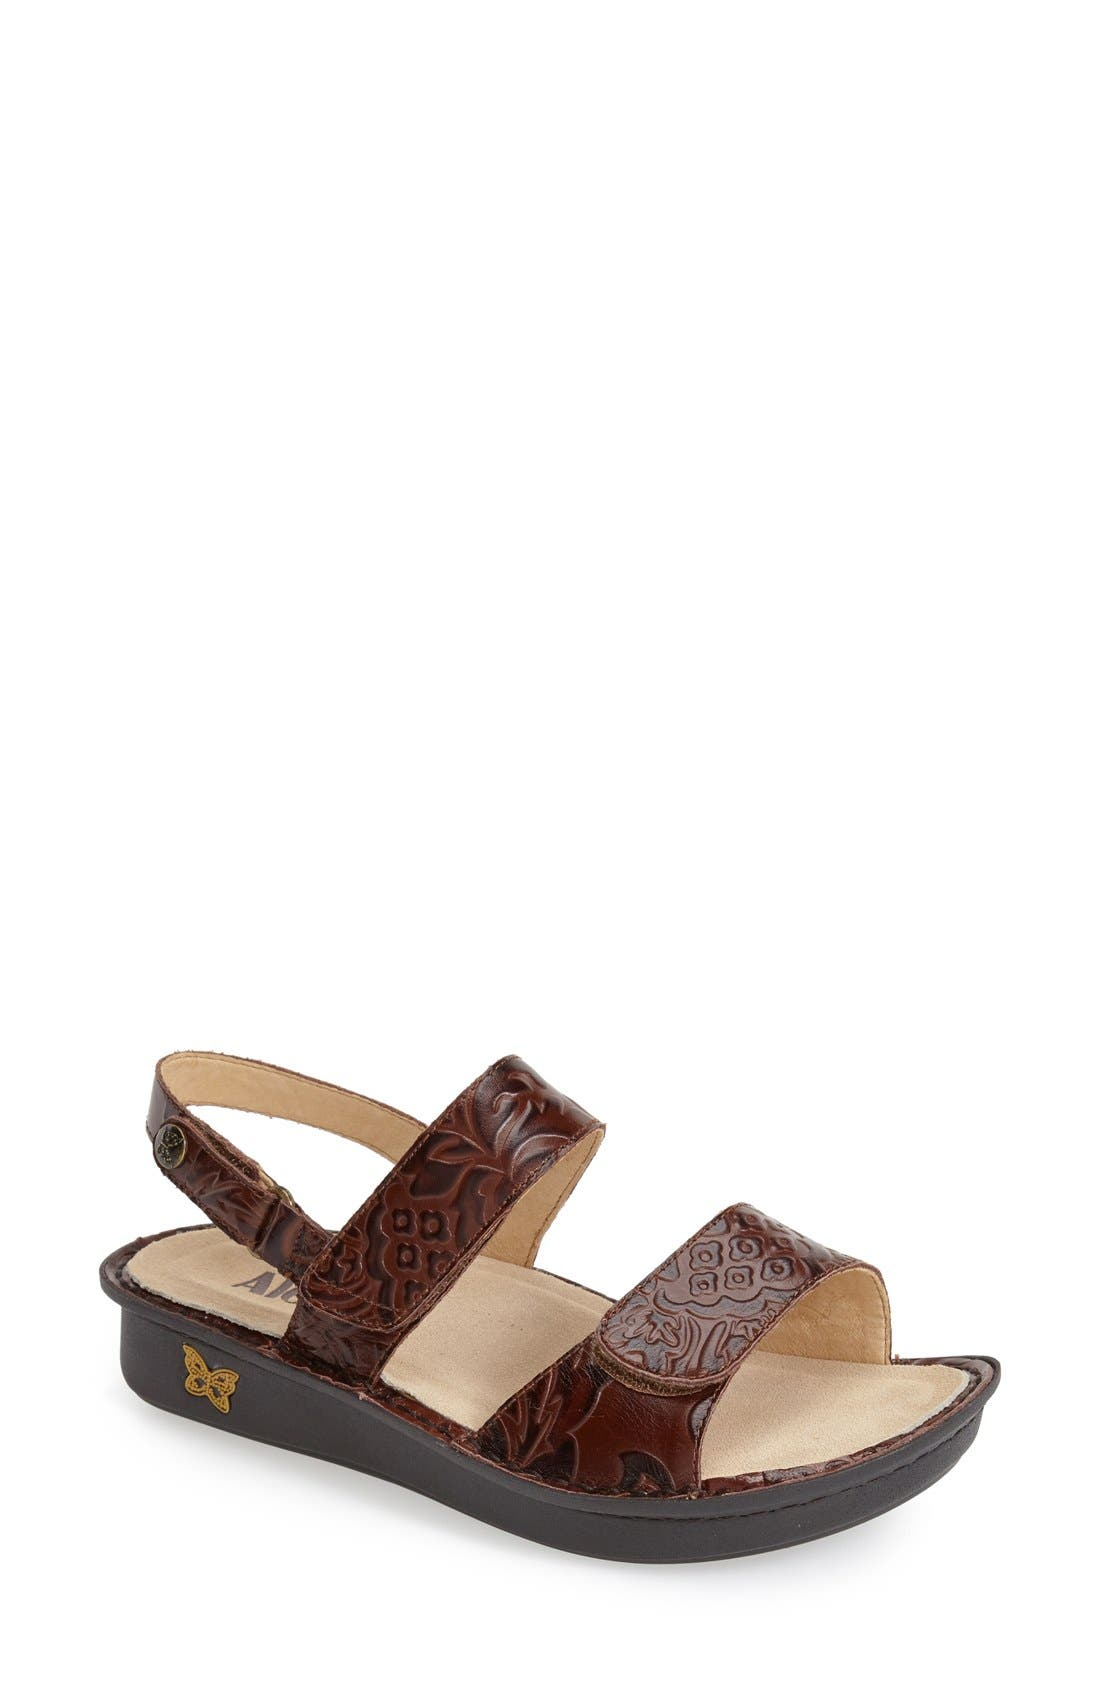 Main Image - Alegria 'Verona' Sandal (Women)